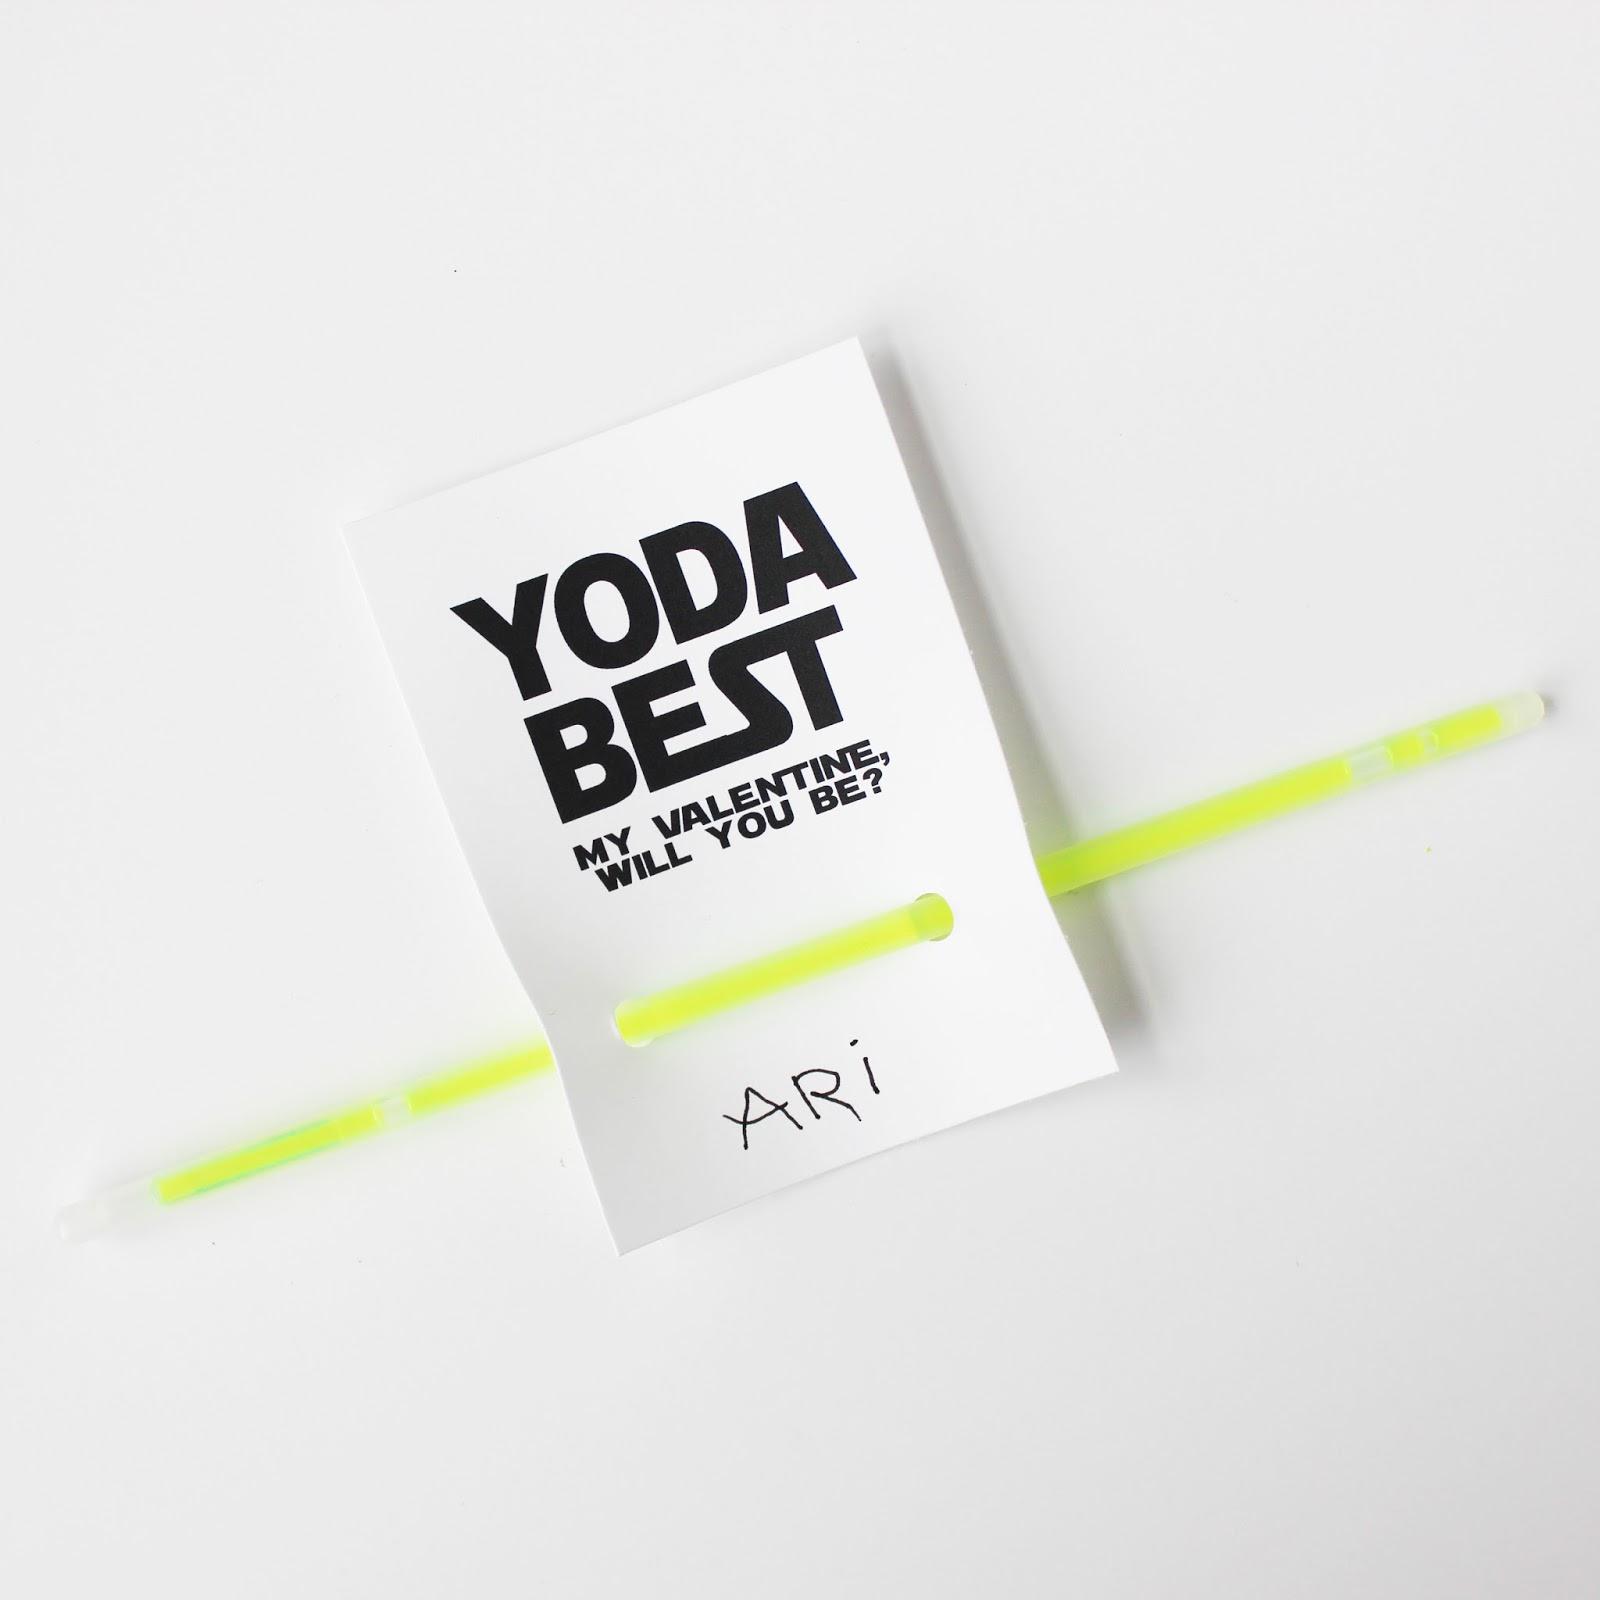 image relating to Yoda Printable called YODA Most straightforward Program VALENTINES (Cost-free PRINTABLE)